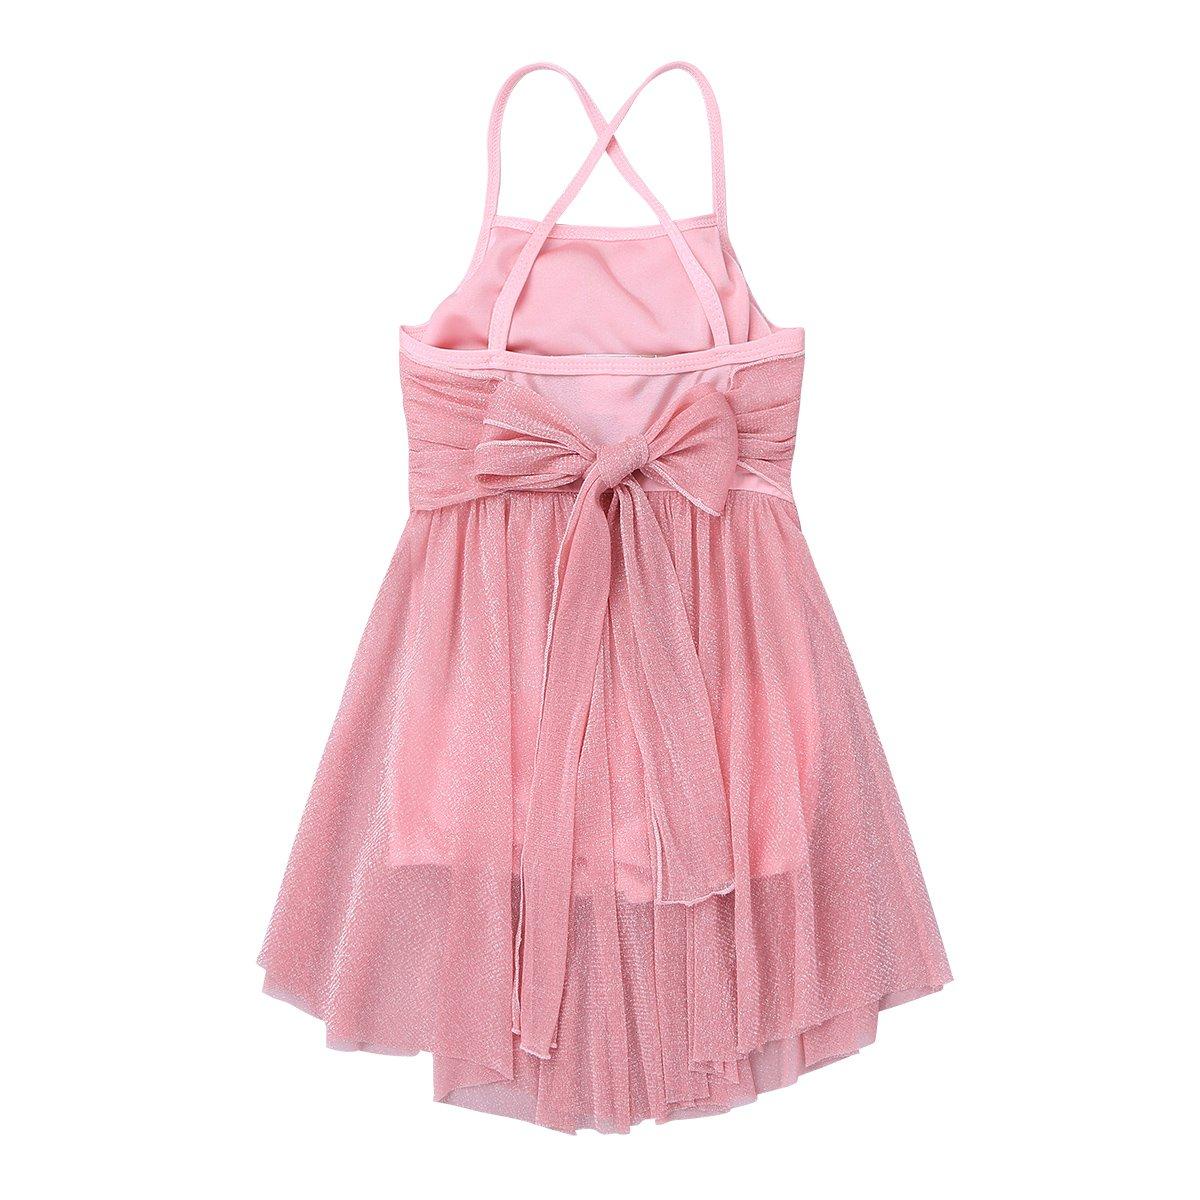 dPois Kids Girls Criss Cross Spaghetti Straps Ballet Latin Lyrical Contemporary Dance Glittery Dress